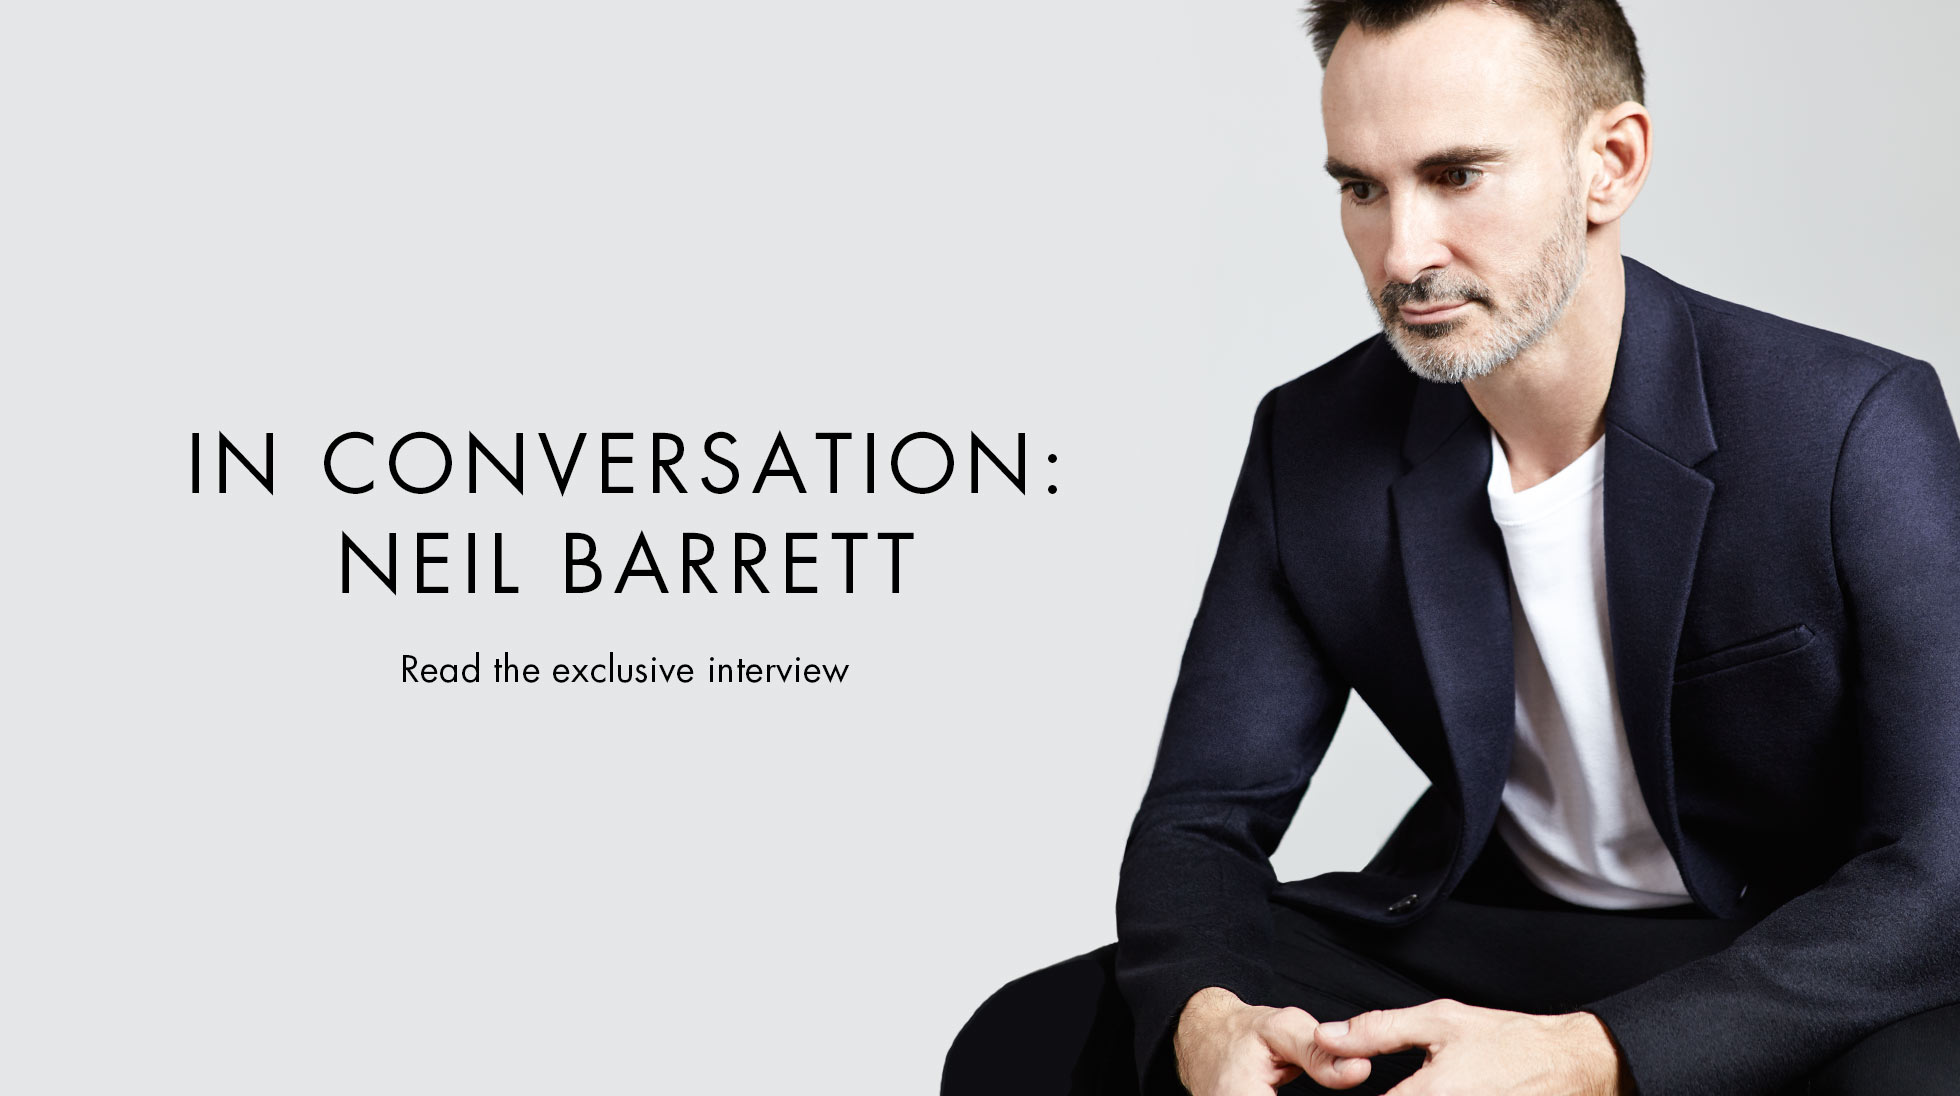 In Conversation: Neil Barrett